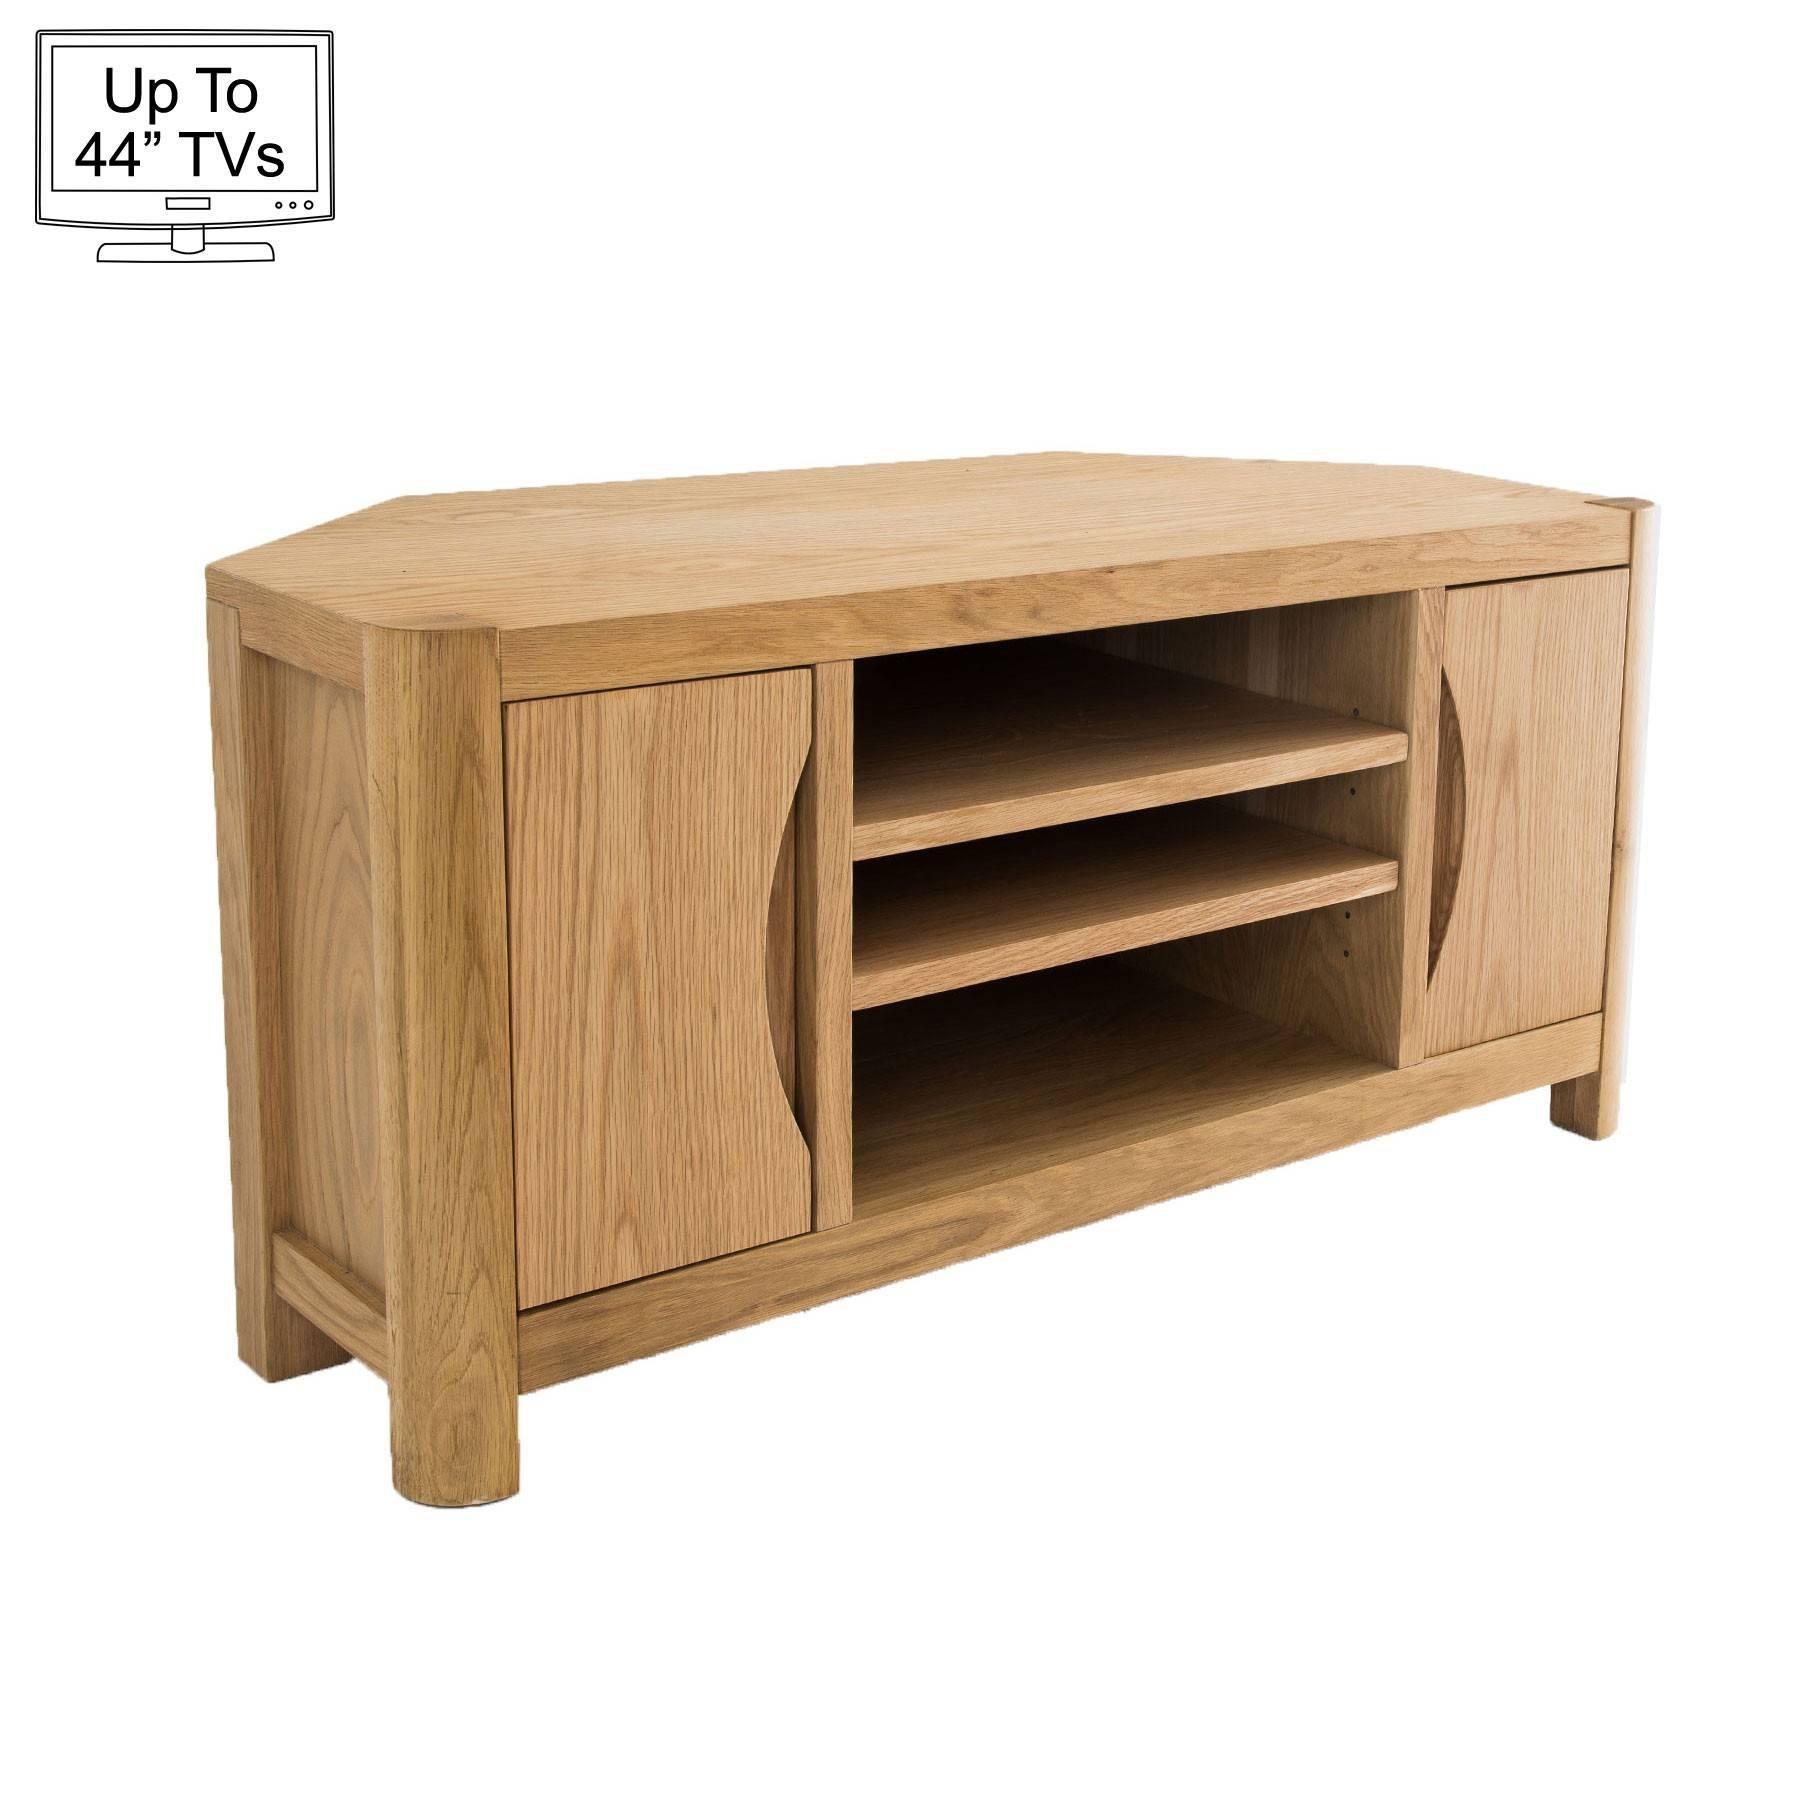 "Light Oak Corner Tv Stand For Up To 44"" Tvs pertaining to Light Oak Corner Tv Cabinets (Image 4 of 15)"